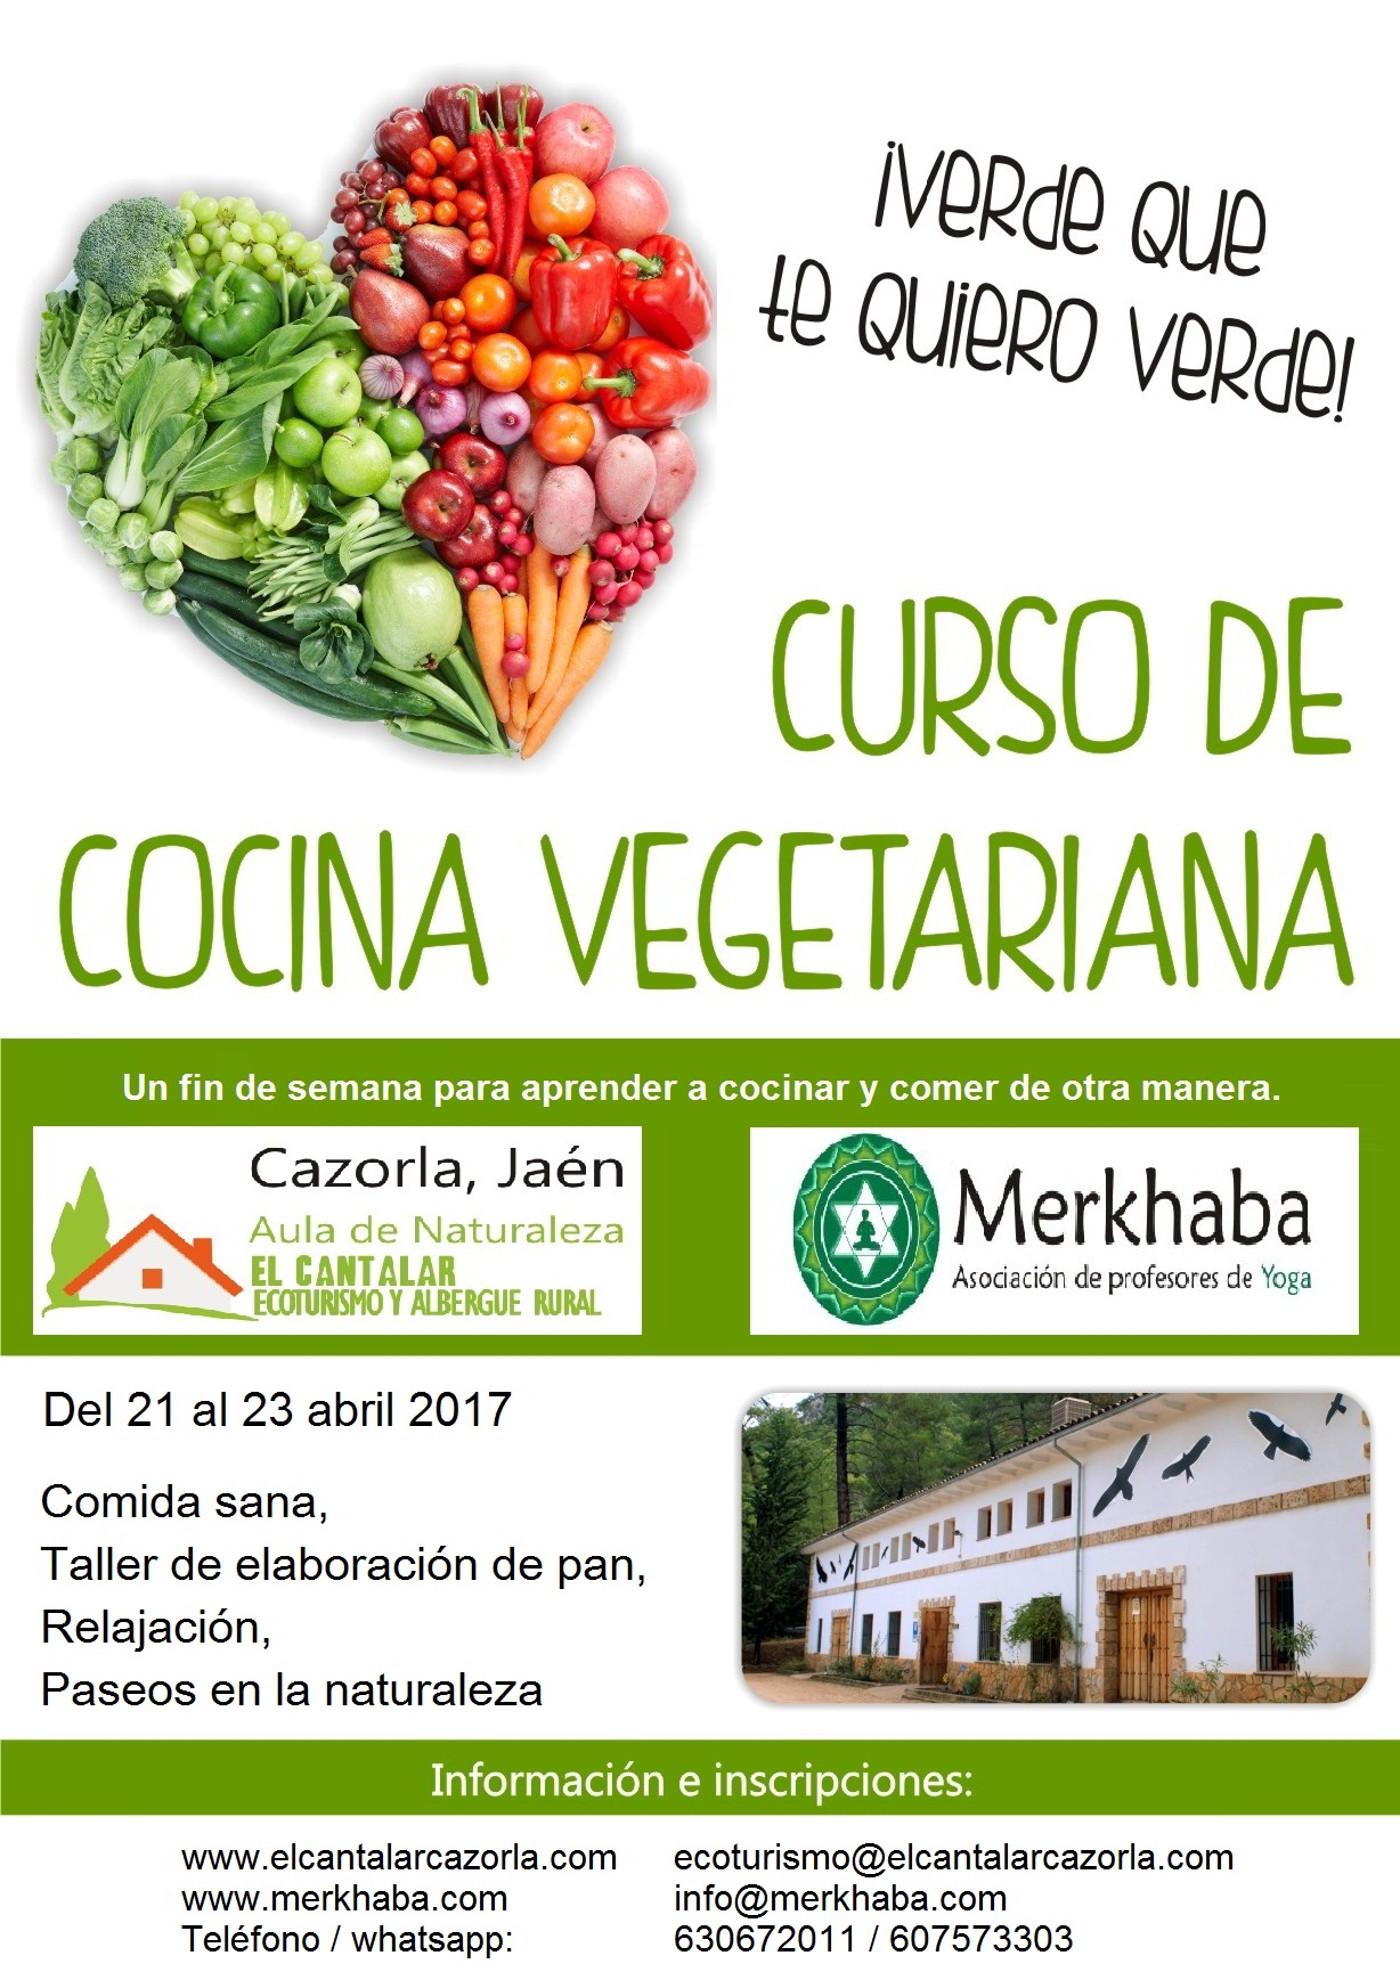 Curso De Cocina Vegetariana | Curso De Cocina Vegetariana Experiencias En La Naturaleza